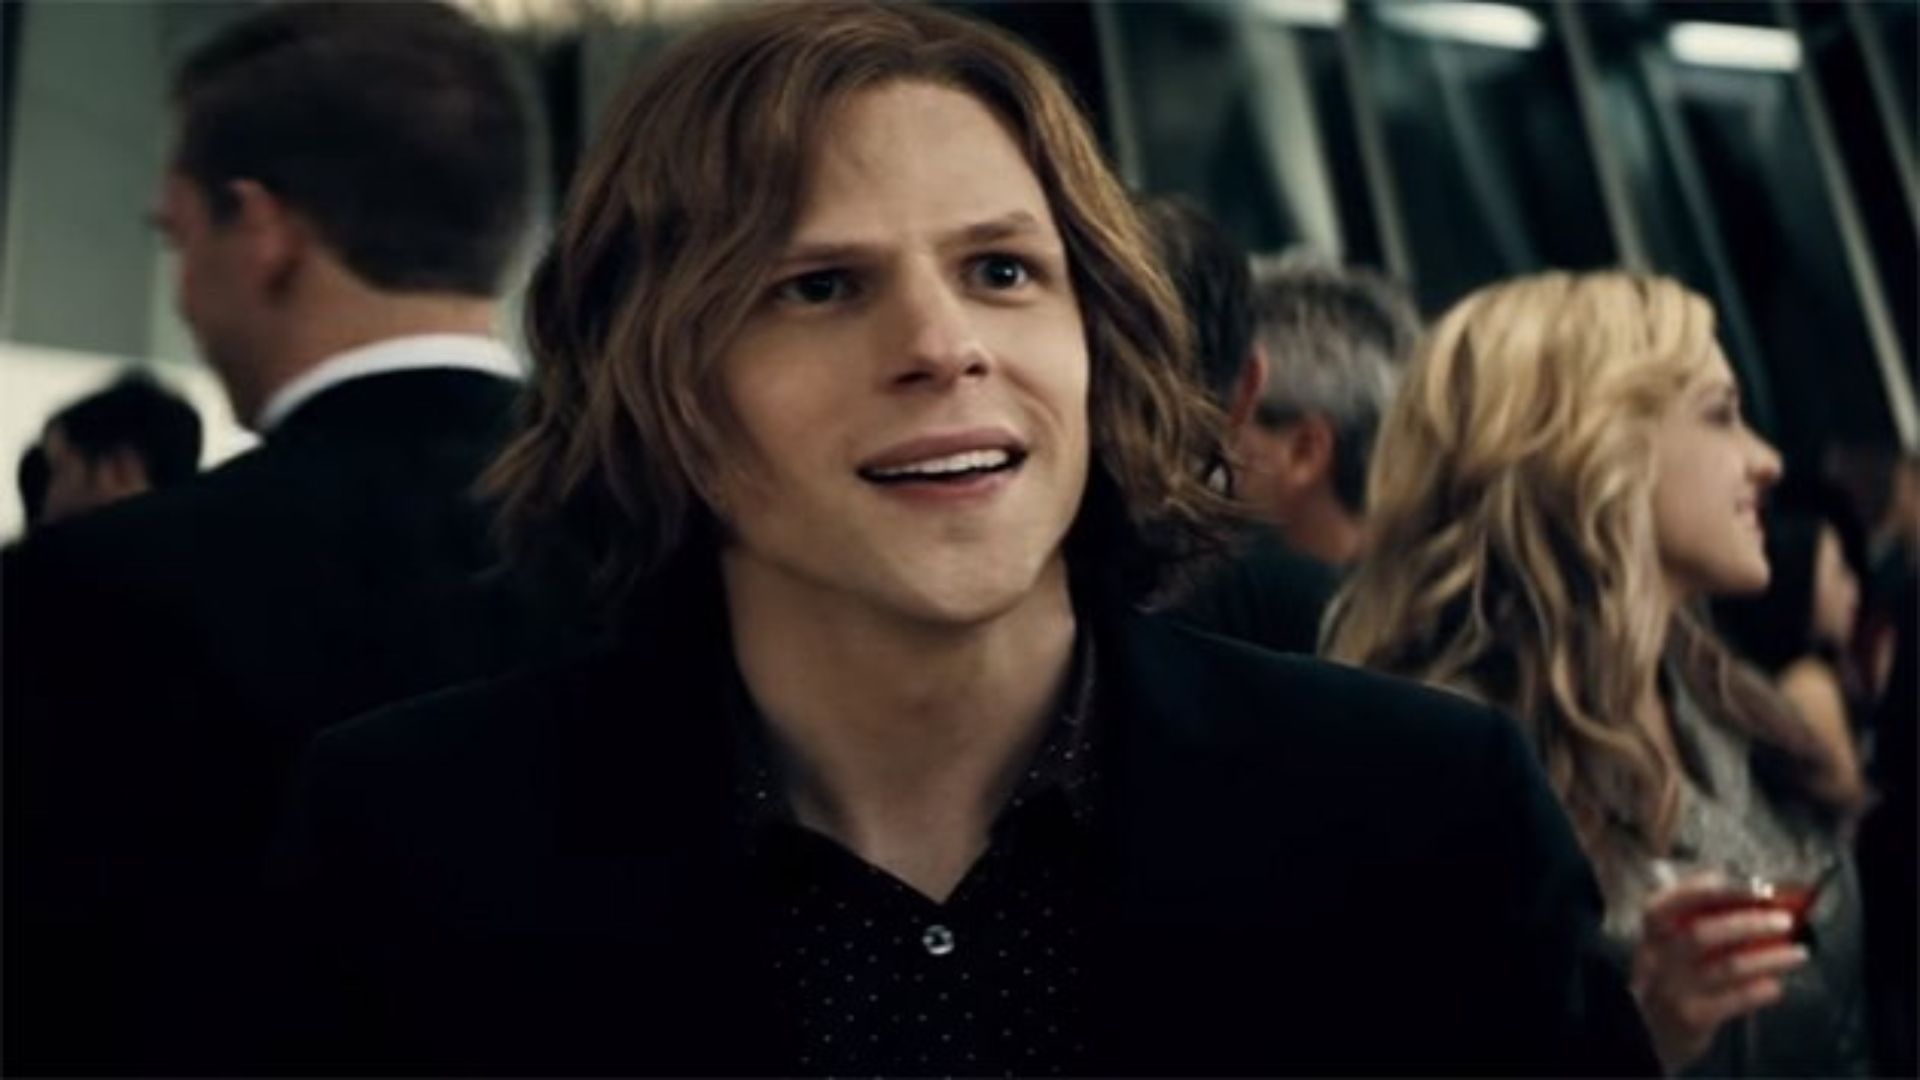 Jesse-Eisenberg-Batman-Superman-Lex-Luthor